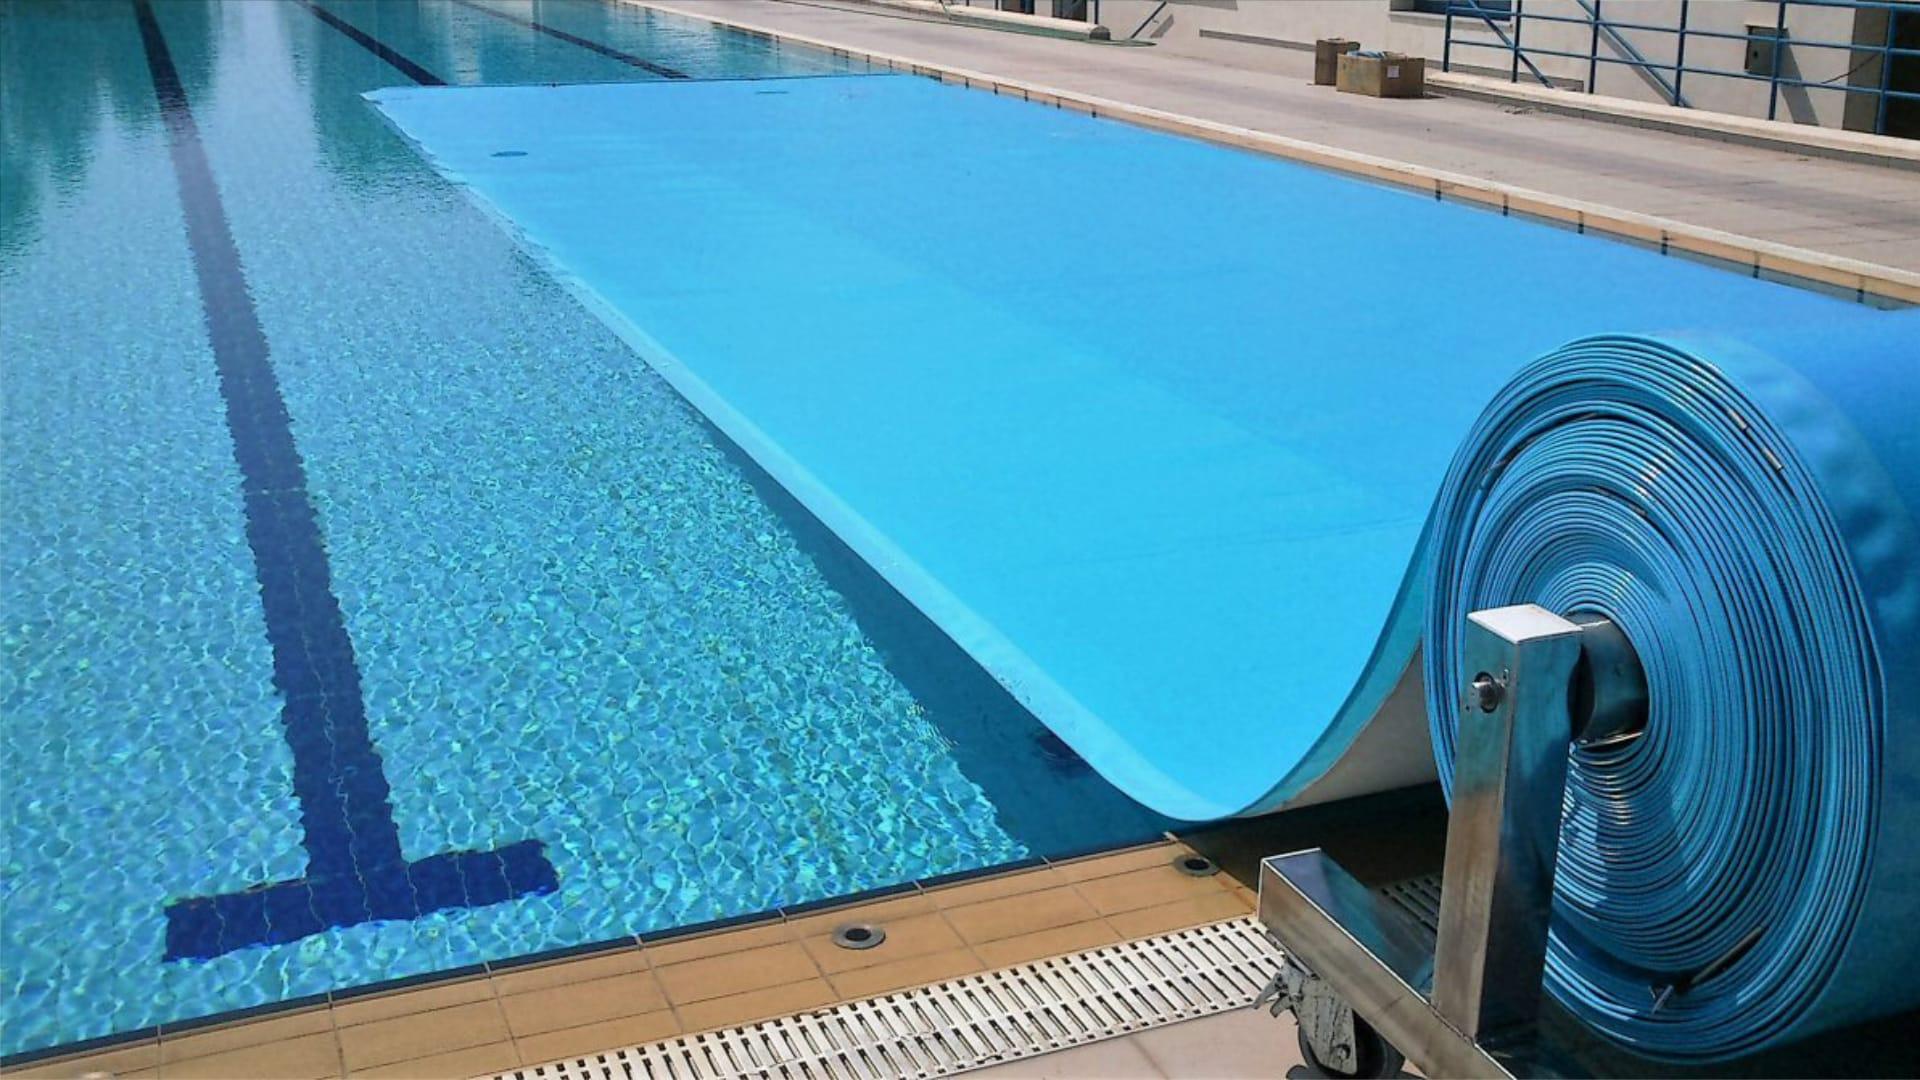 Rulli avvolgitori piscine grandi dimensioni | Favaretti Group